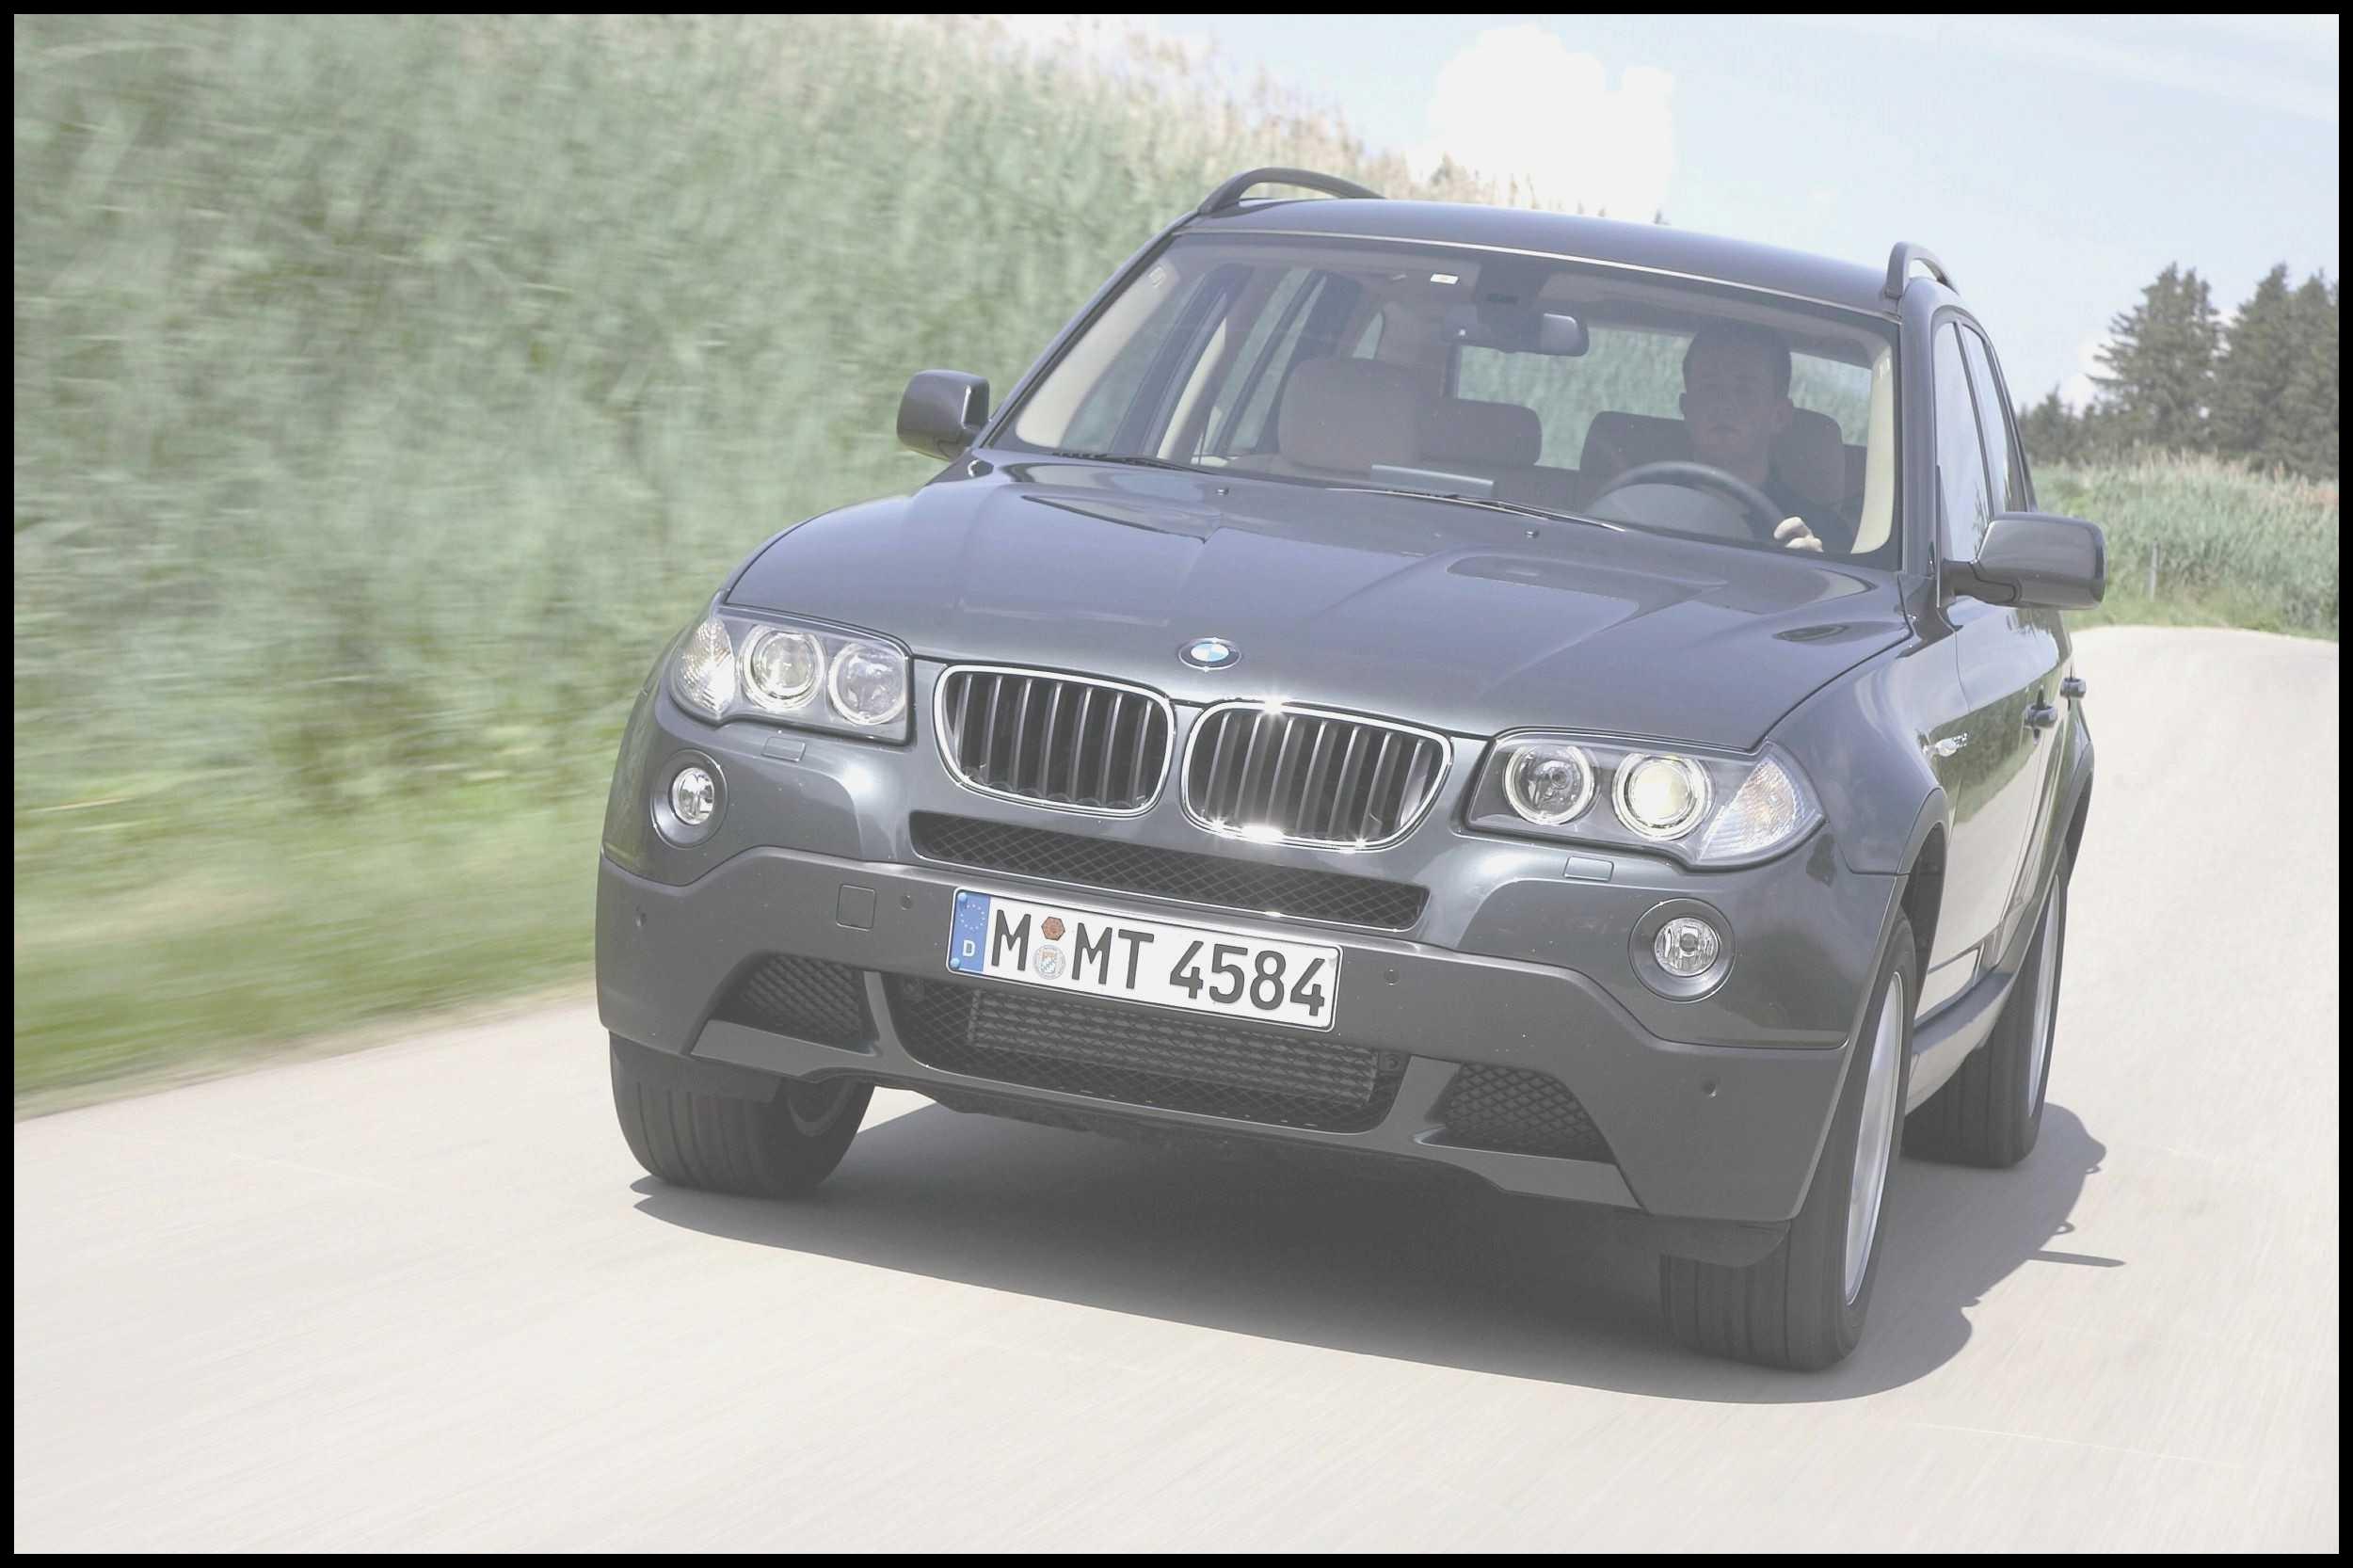 San Diego Bmw Bmw Xdrive Best 2004 Bmw X3 2 0d X Drive – Your Car Wallpapper Models Unique